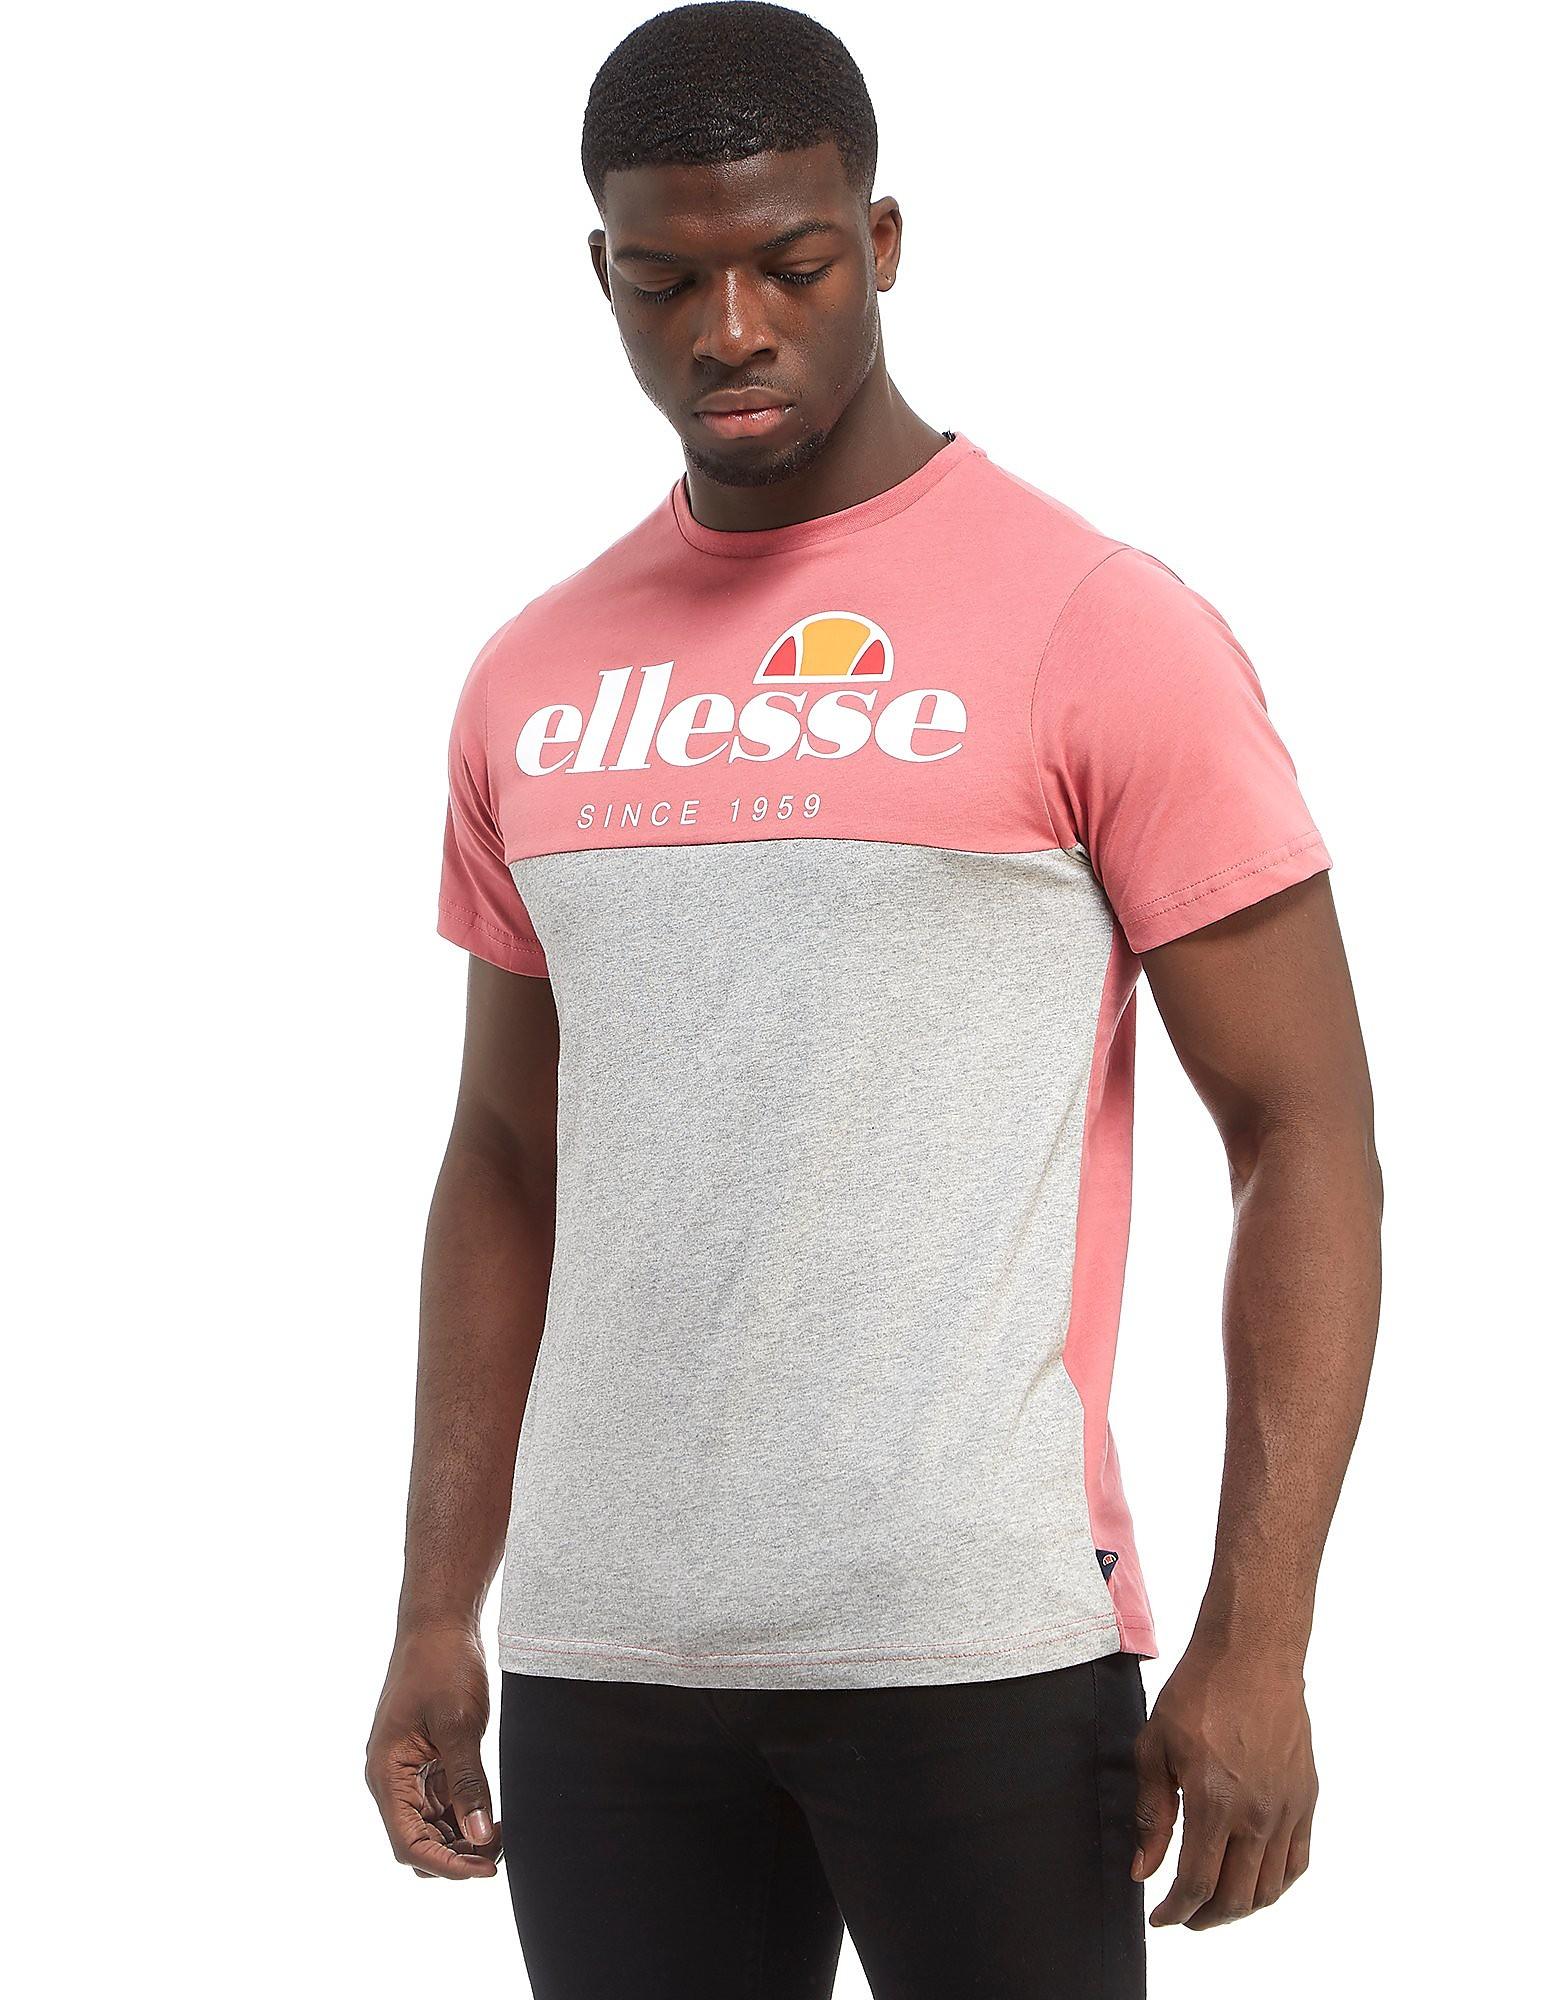 Ellesse Renzo Colourblock T-Shirt Homme